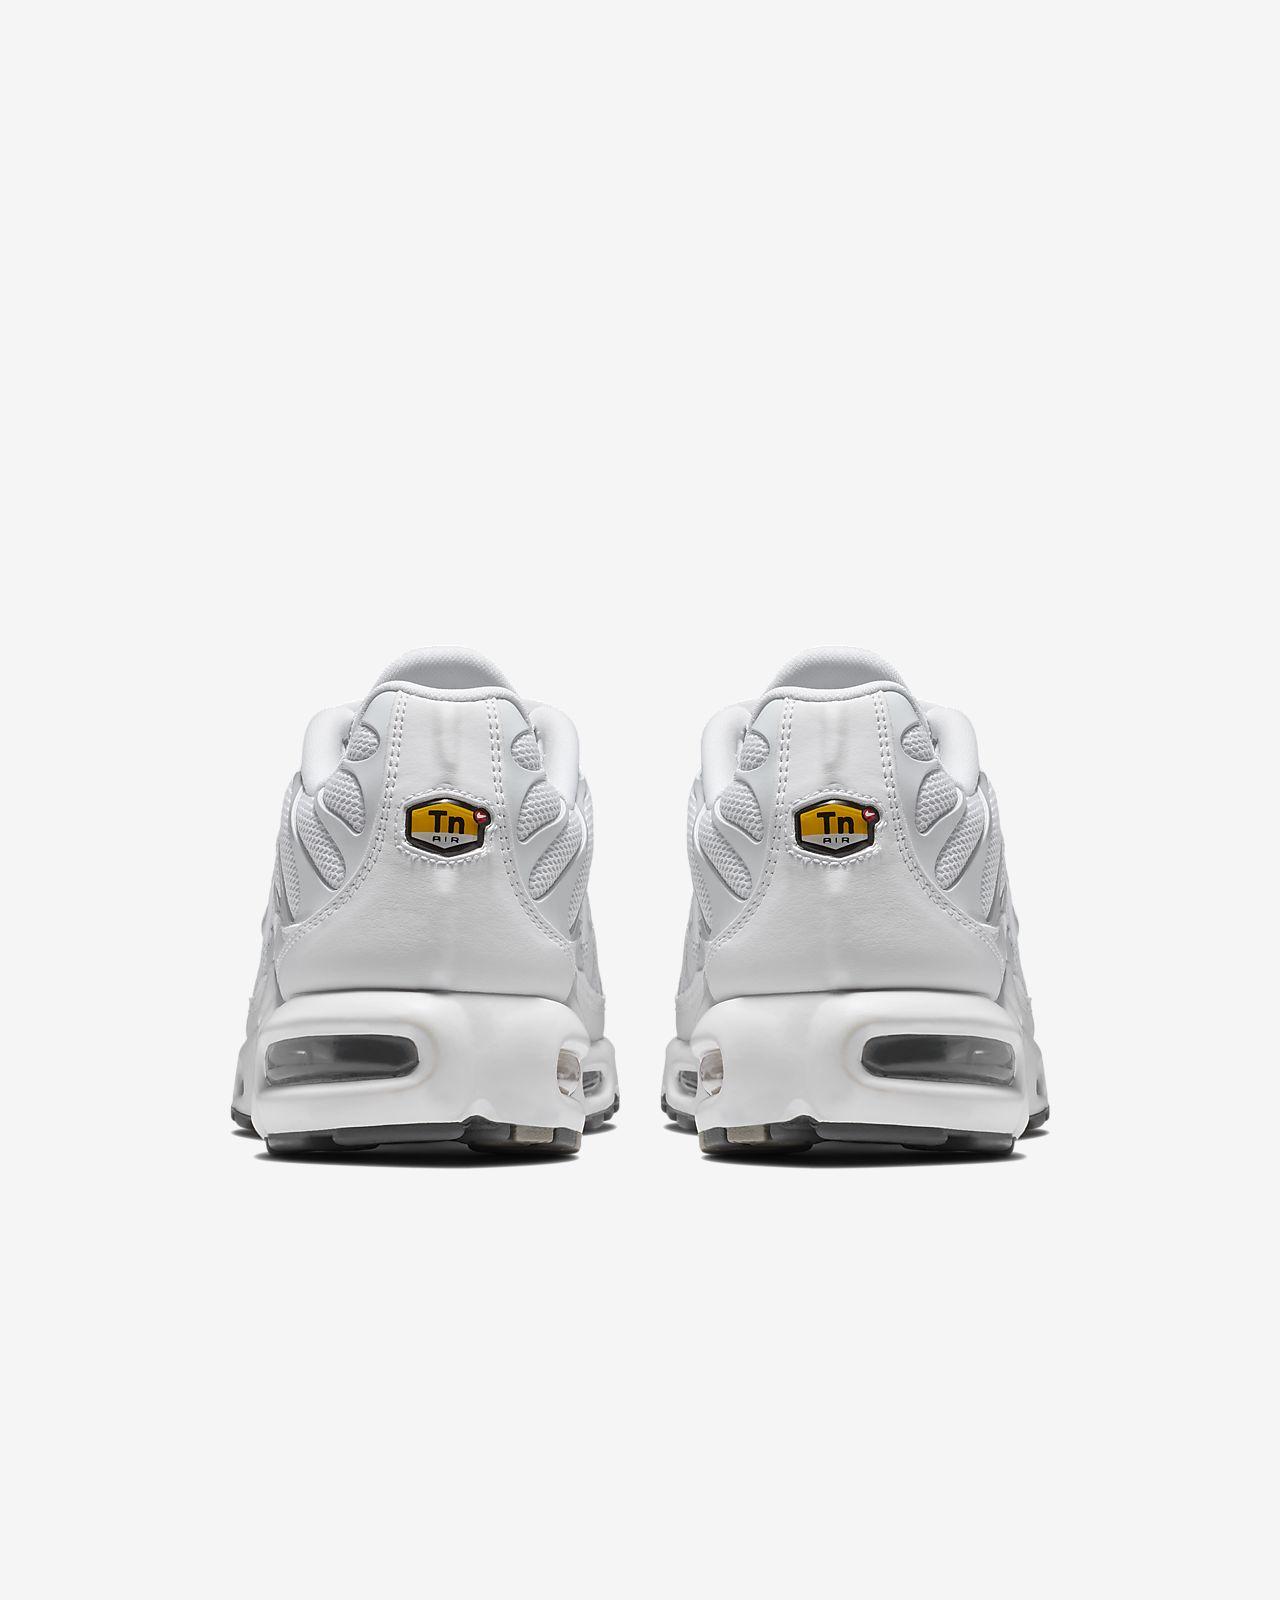 45c508de364 Nike Air Max Plus Men s Shoe. Nike.com GB